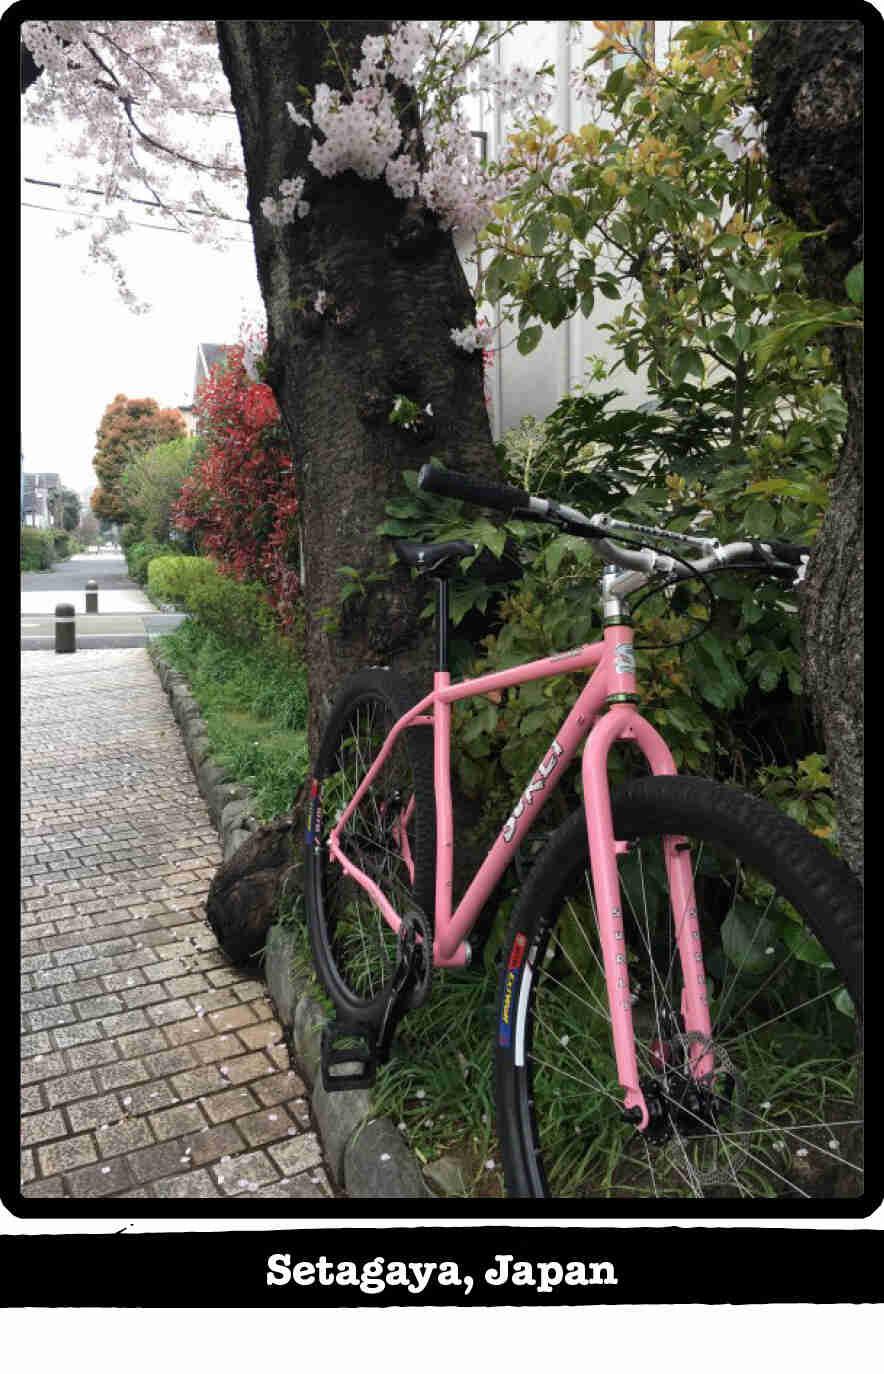 Front left view of a Surly Karate Monkey bike, pink, in the weeds alongside a sidewalk - Setagaya, Japan tag below image